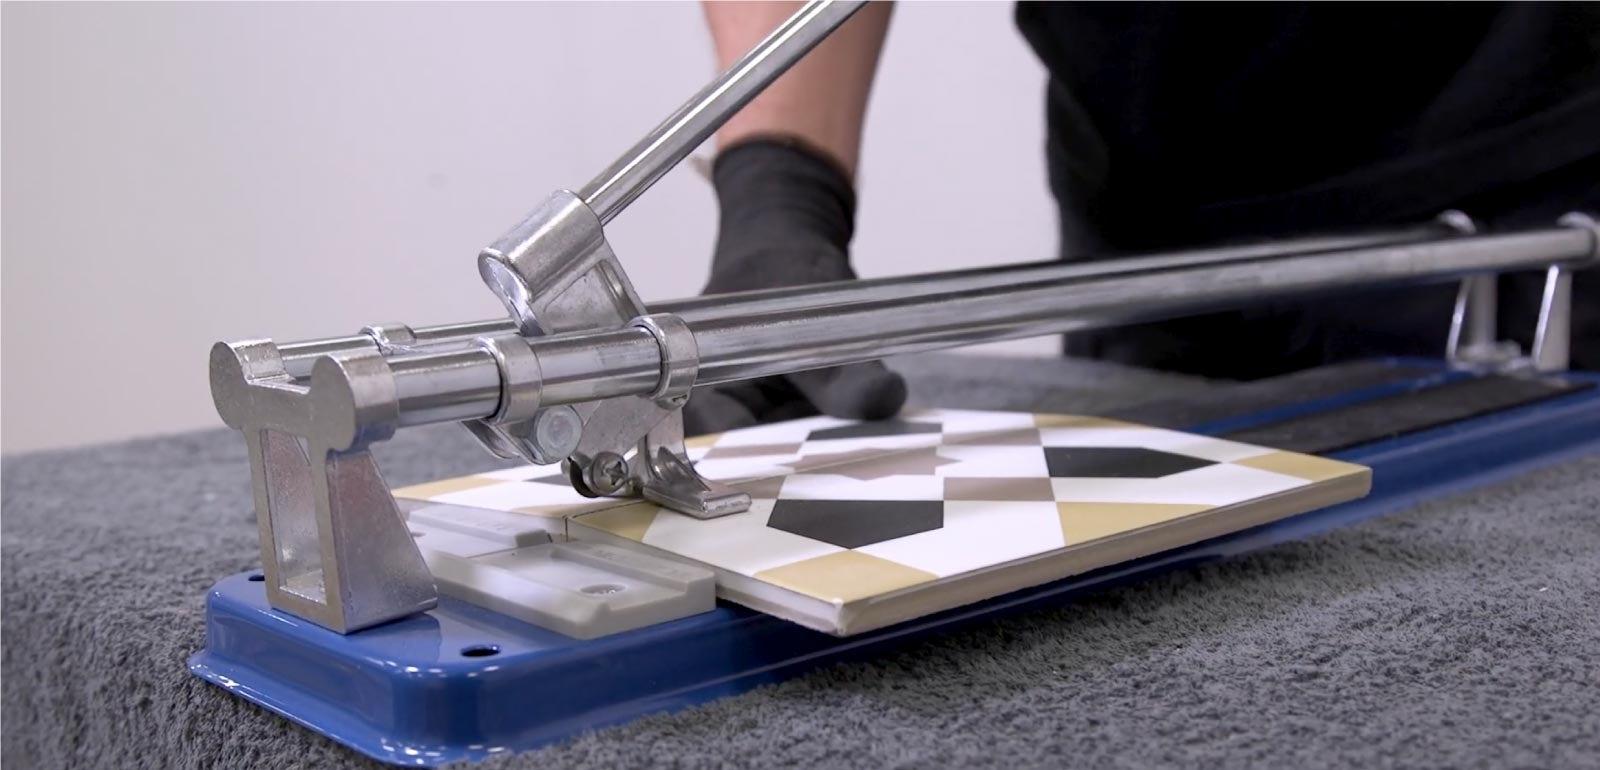 Modern Fixes: How to cut tiles